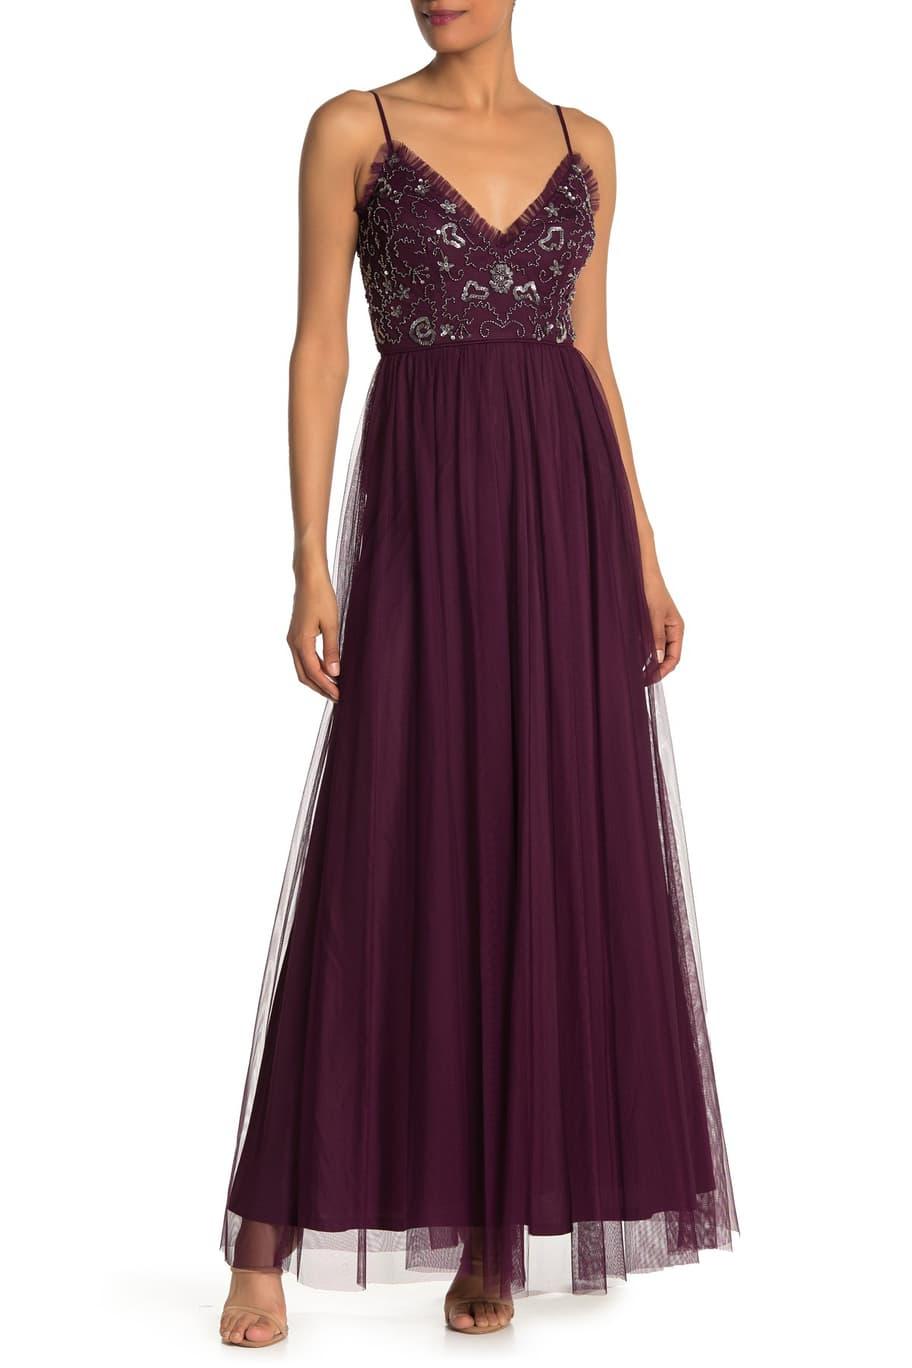 Formal Dresses Nordstrom Rack In 2021 Tulle Gown Dresses Formal Dresses [ 1368 x 912 Pixel ]